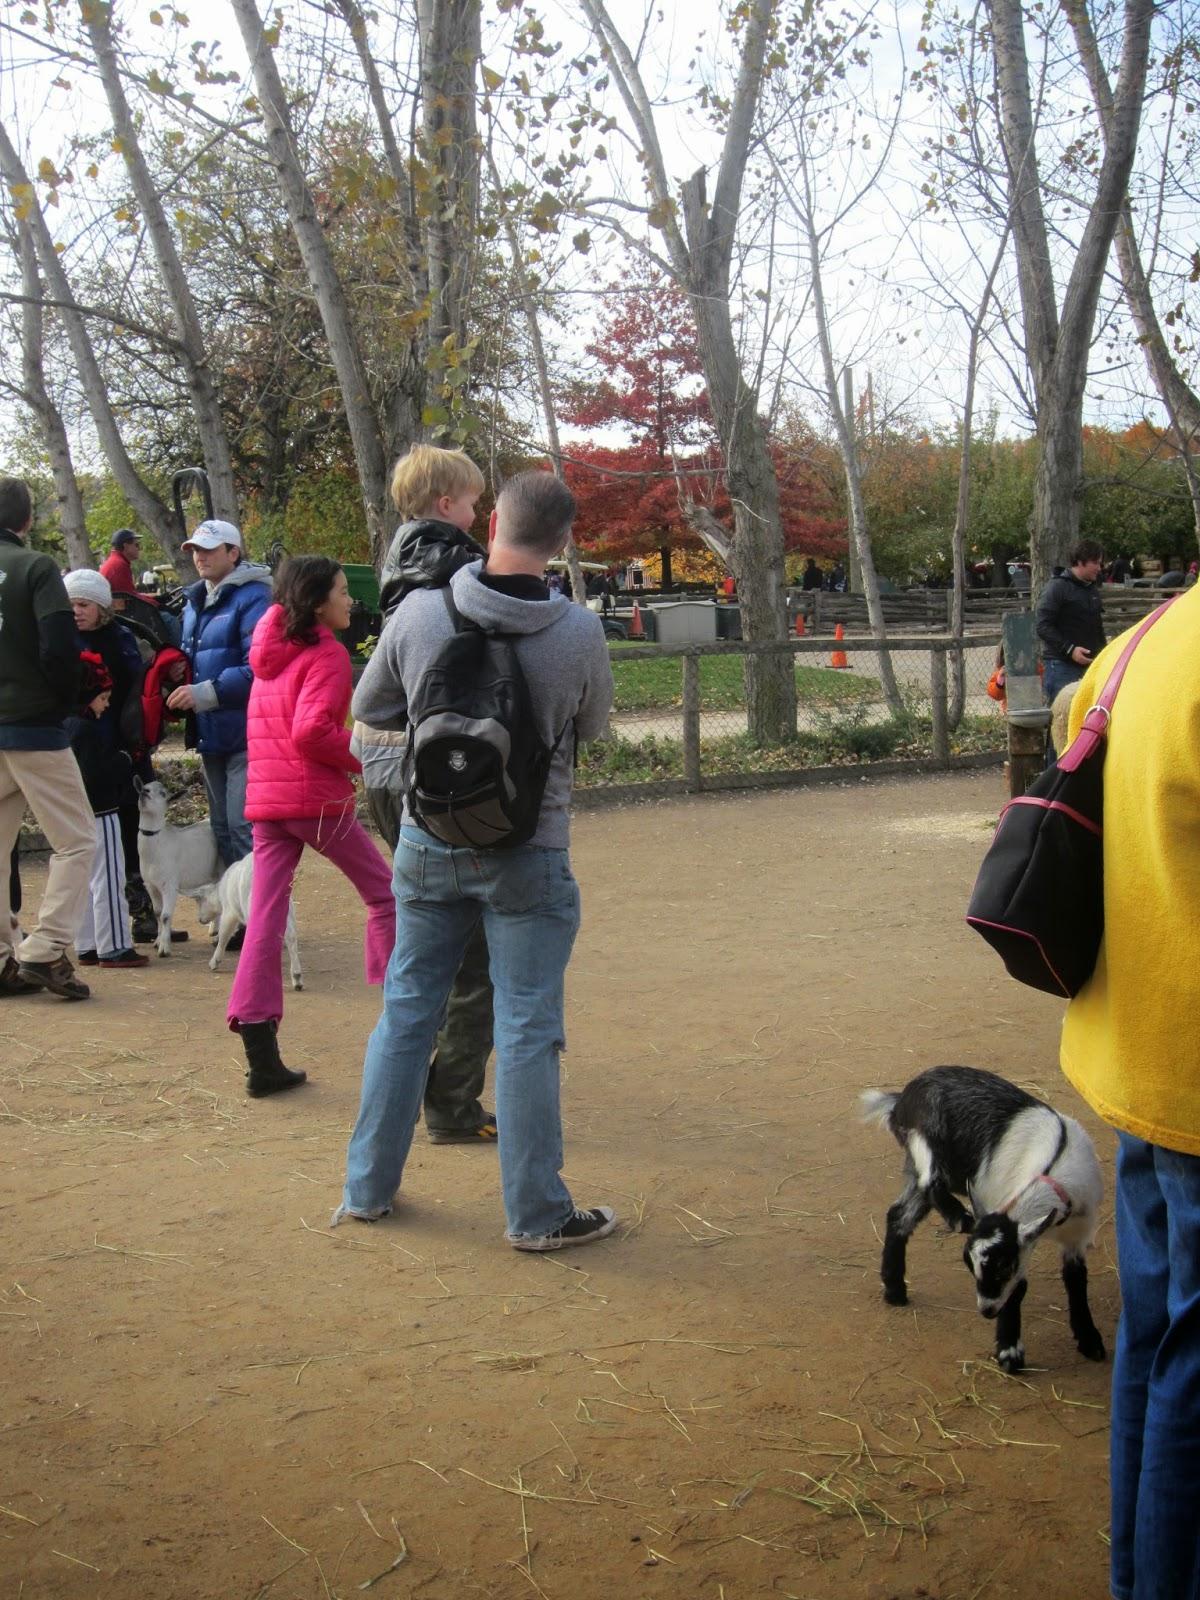 Chudleigh's Farm Petting zoo